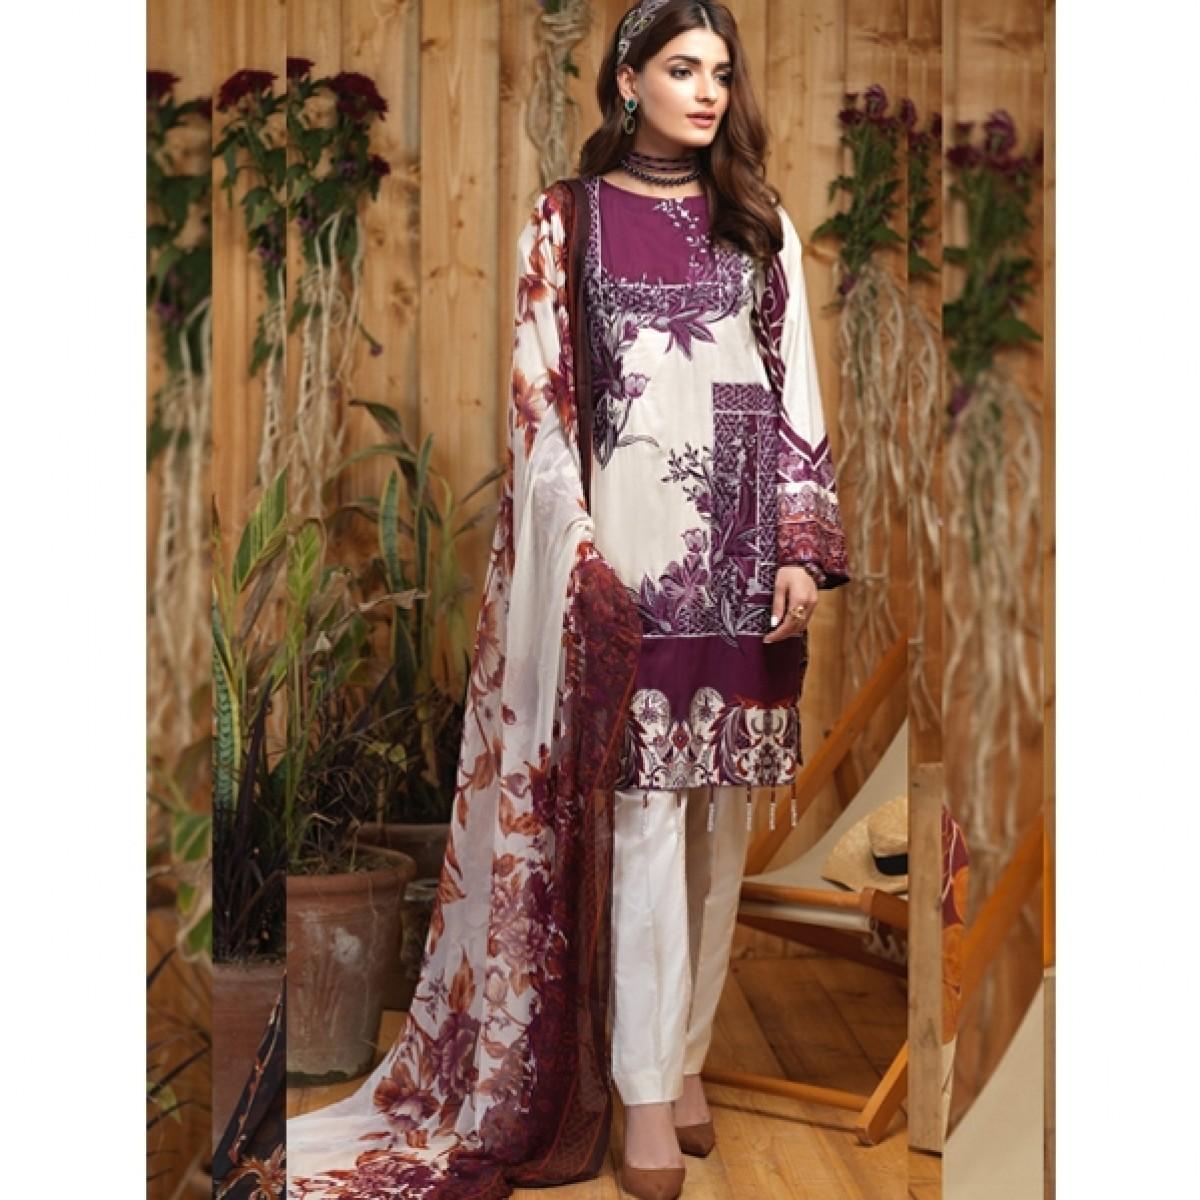 26680ba0a6 Salitex Silkoria Emb Collection Vol 4 2019 (RC-163A) Price in Pakistan |  Buy Salitex Silkoria Lawn Collection 3 Piece | iShopping.pk